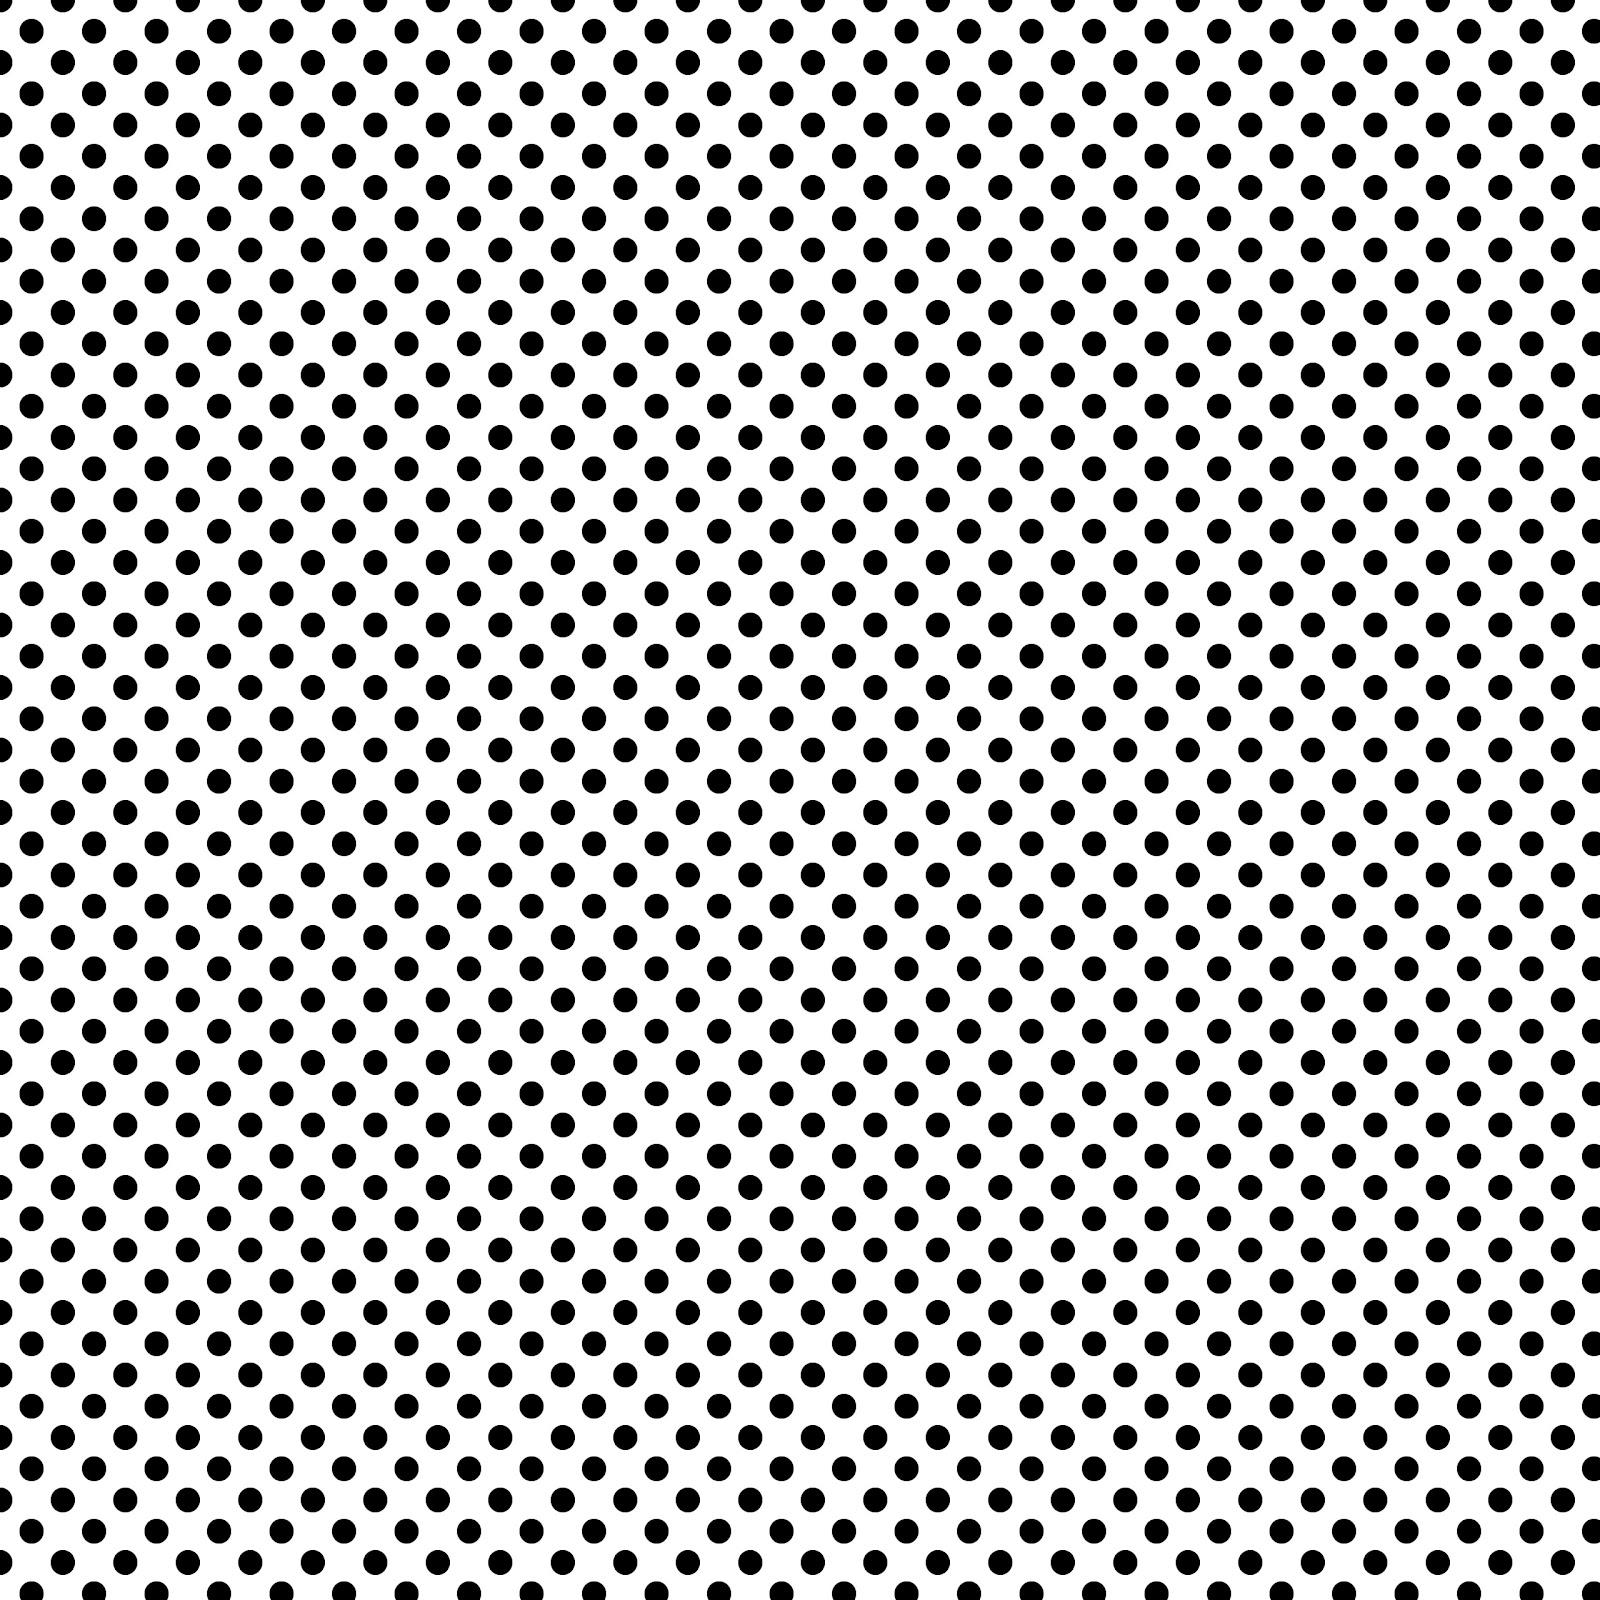 Stampin DAmour FREE Digi Scrapbook Paper   Black White Polka Dots 1600x1600